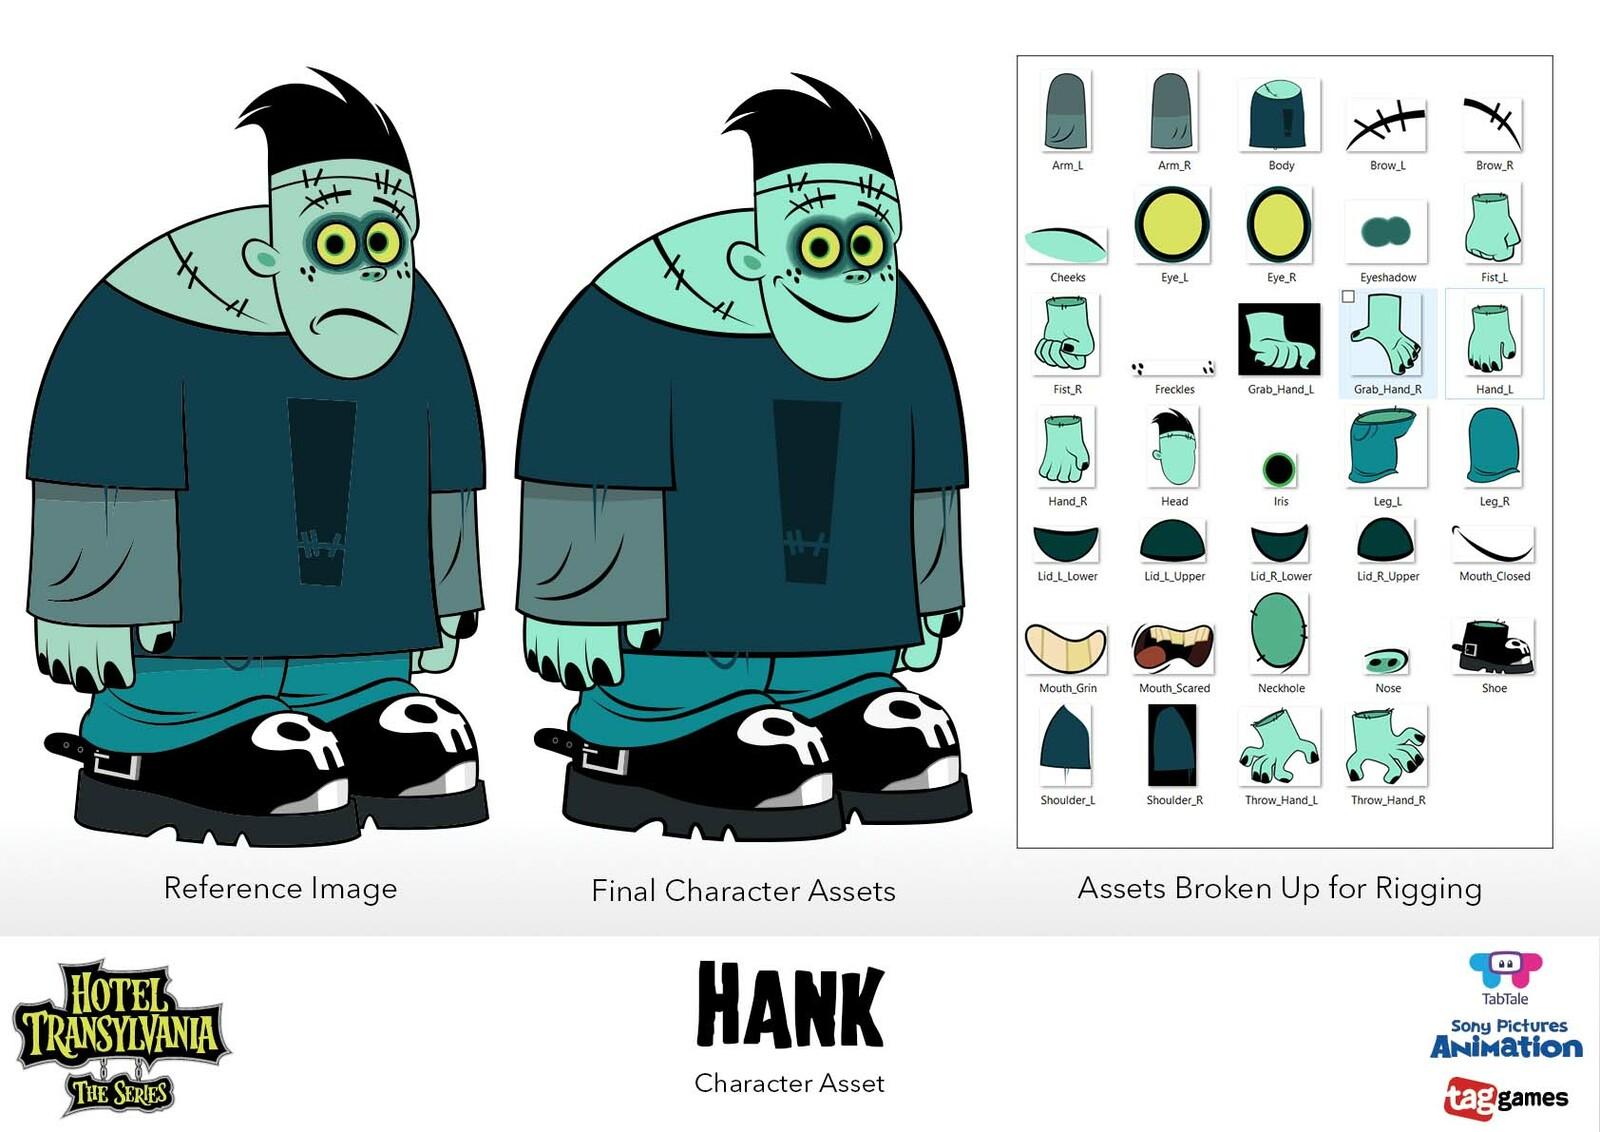 Character Assets - Hank